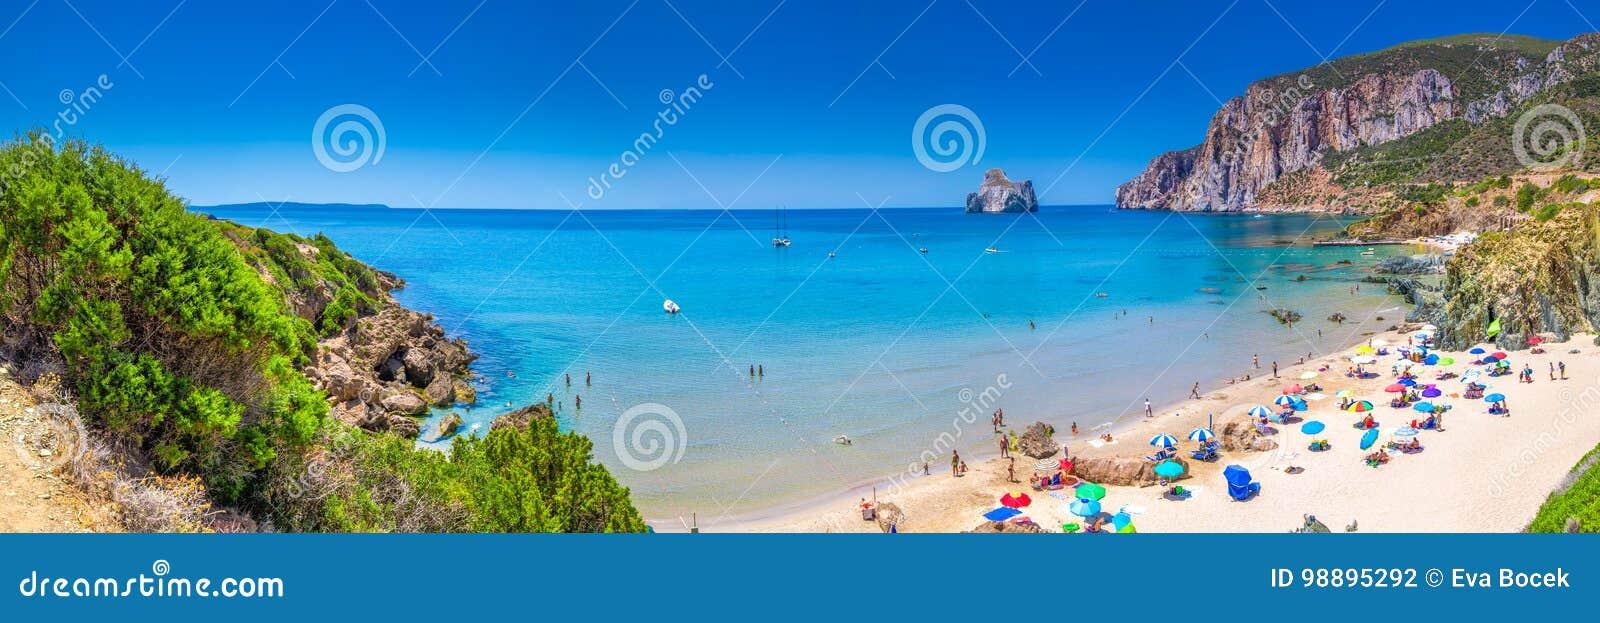 Playa y Pan di Zucchero, Costa Verde, Cerdeña, Italia de Spaggia di Masua